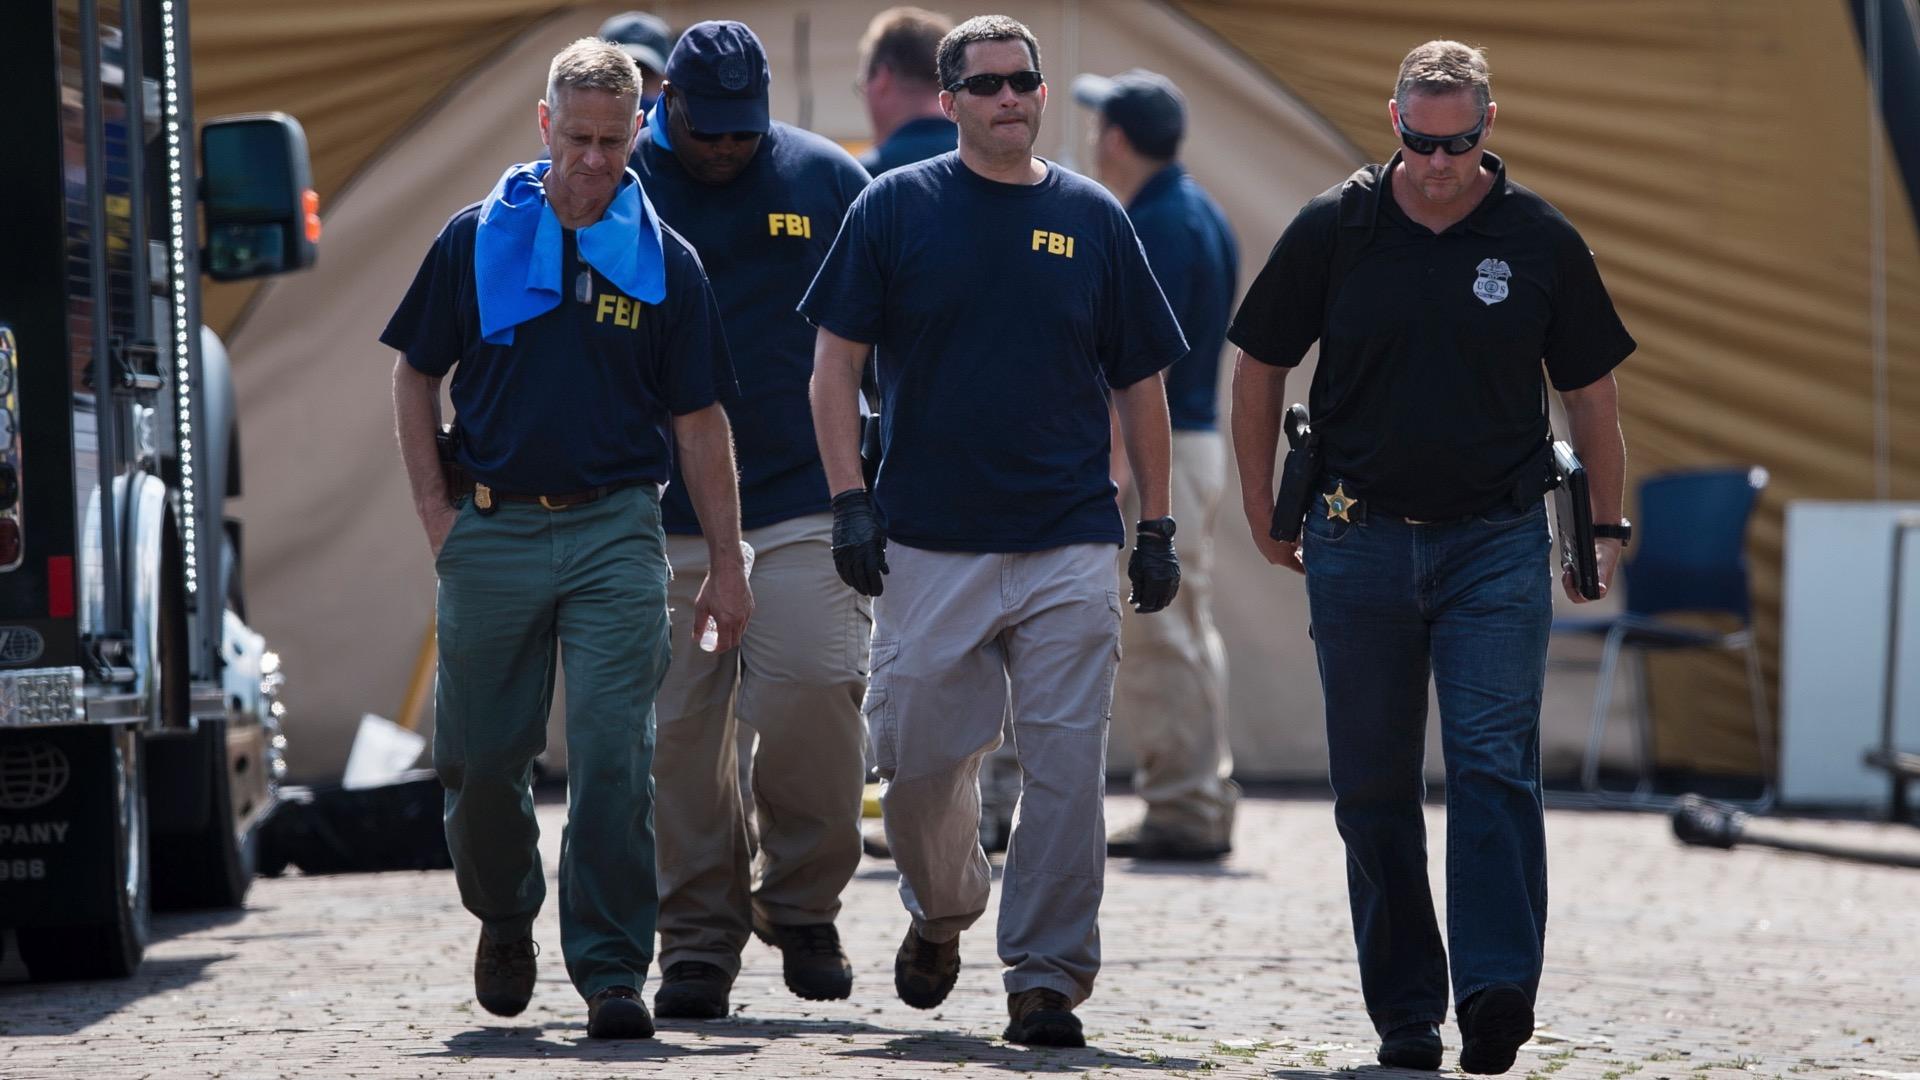 Orlando shooter's wife facing intense scrutiny from the FBI